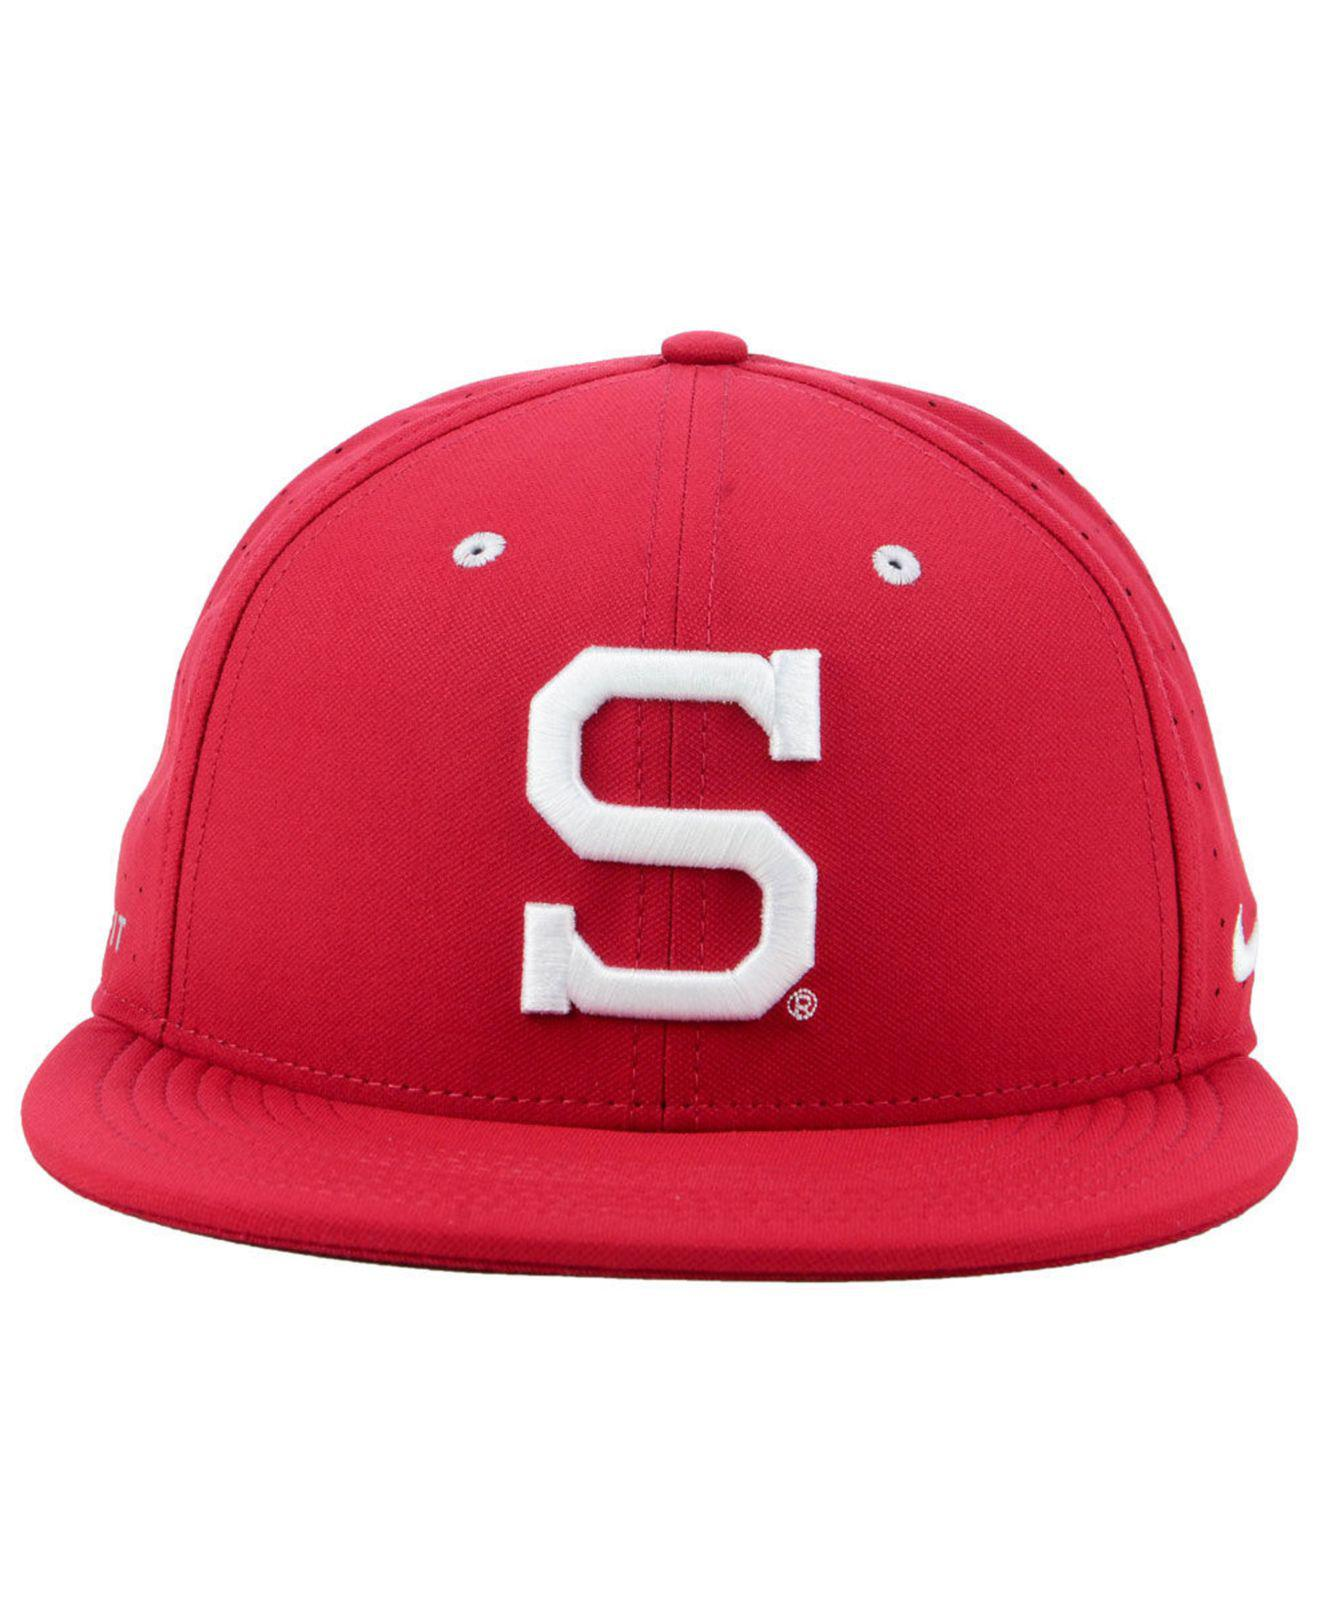 buy popular c6b9f f1f17 Nike - Red Stanford Cardinal Aerobill True Fitted Baseball Cap for Men -  Lyst. View fullscreen